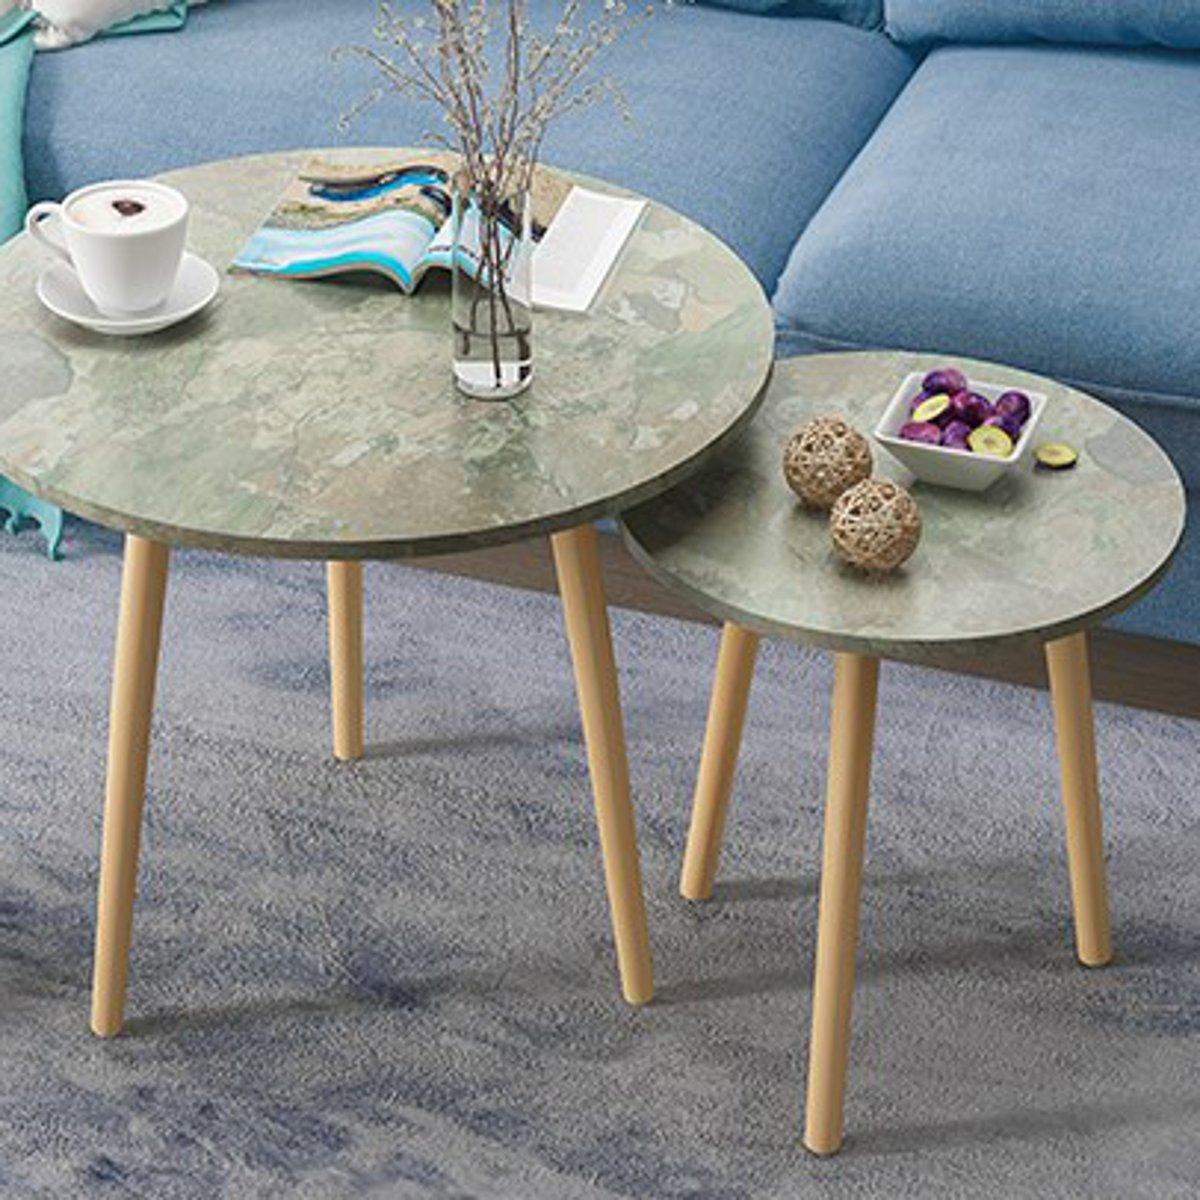 Fashion Coffee Tables Simple Mini Nordic Convenient Sofa Modern Circular Practical Natural Tea Tables Living Room Decoration